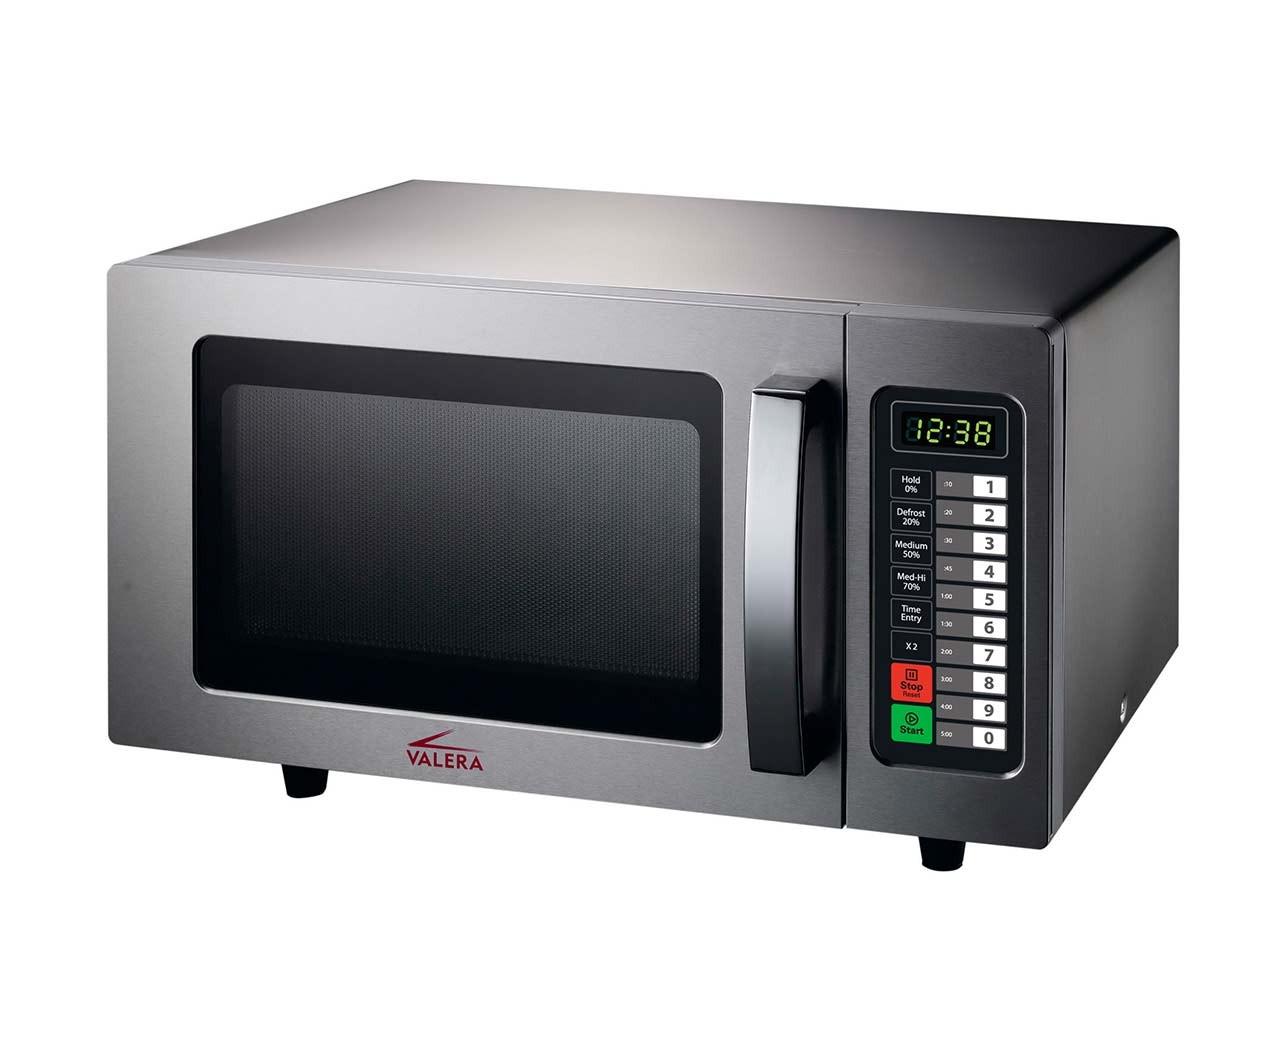 Valera Microwaves